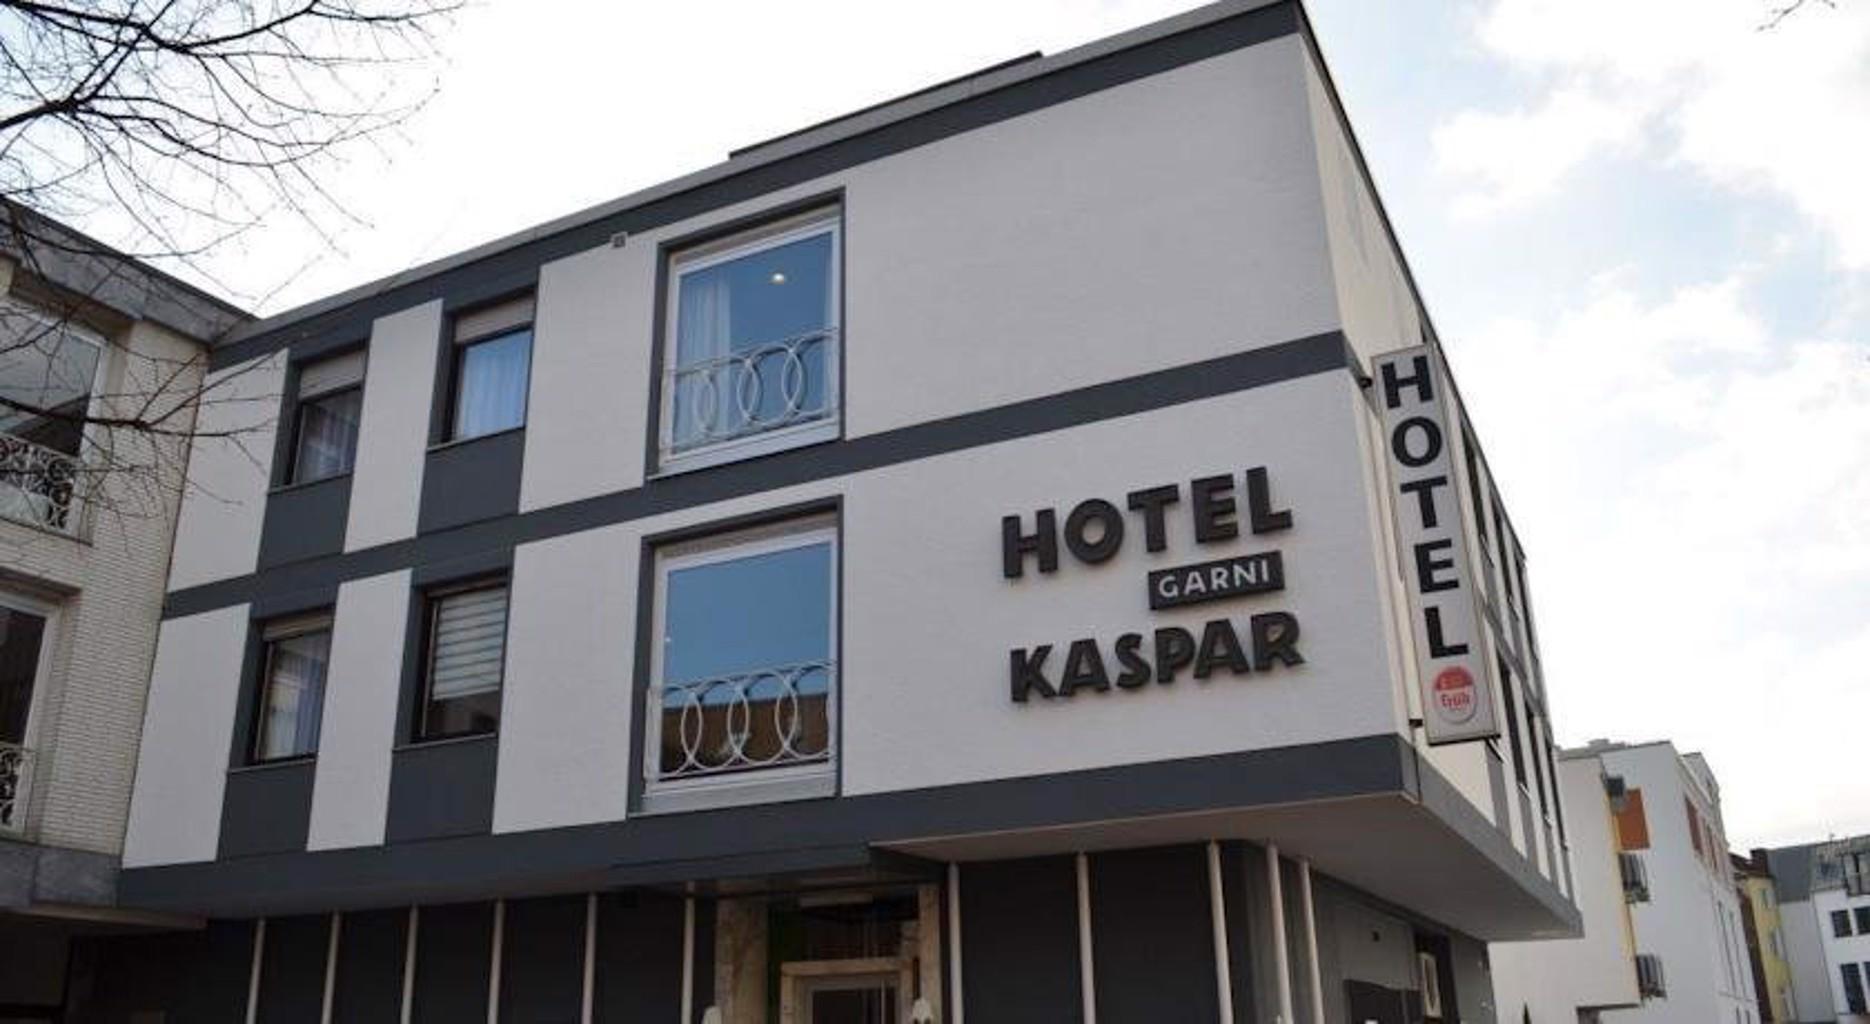 Hotel Kaspar Garni